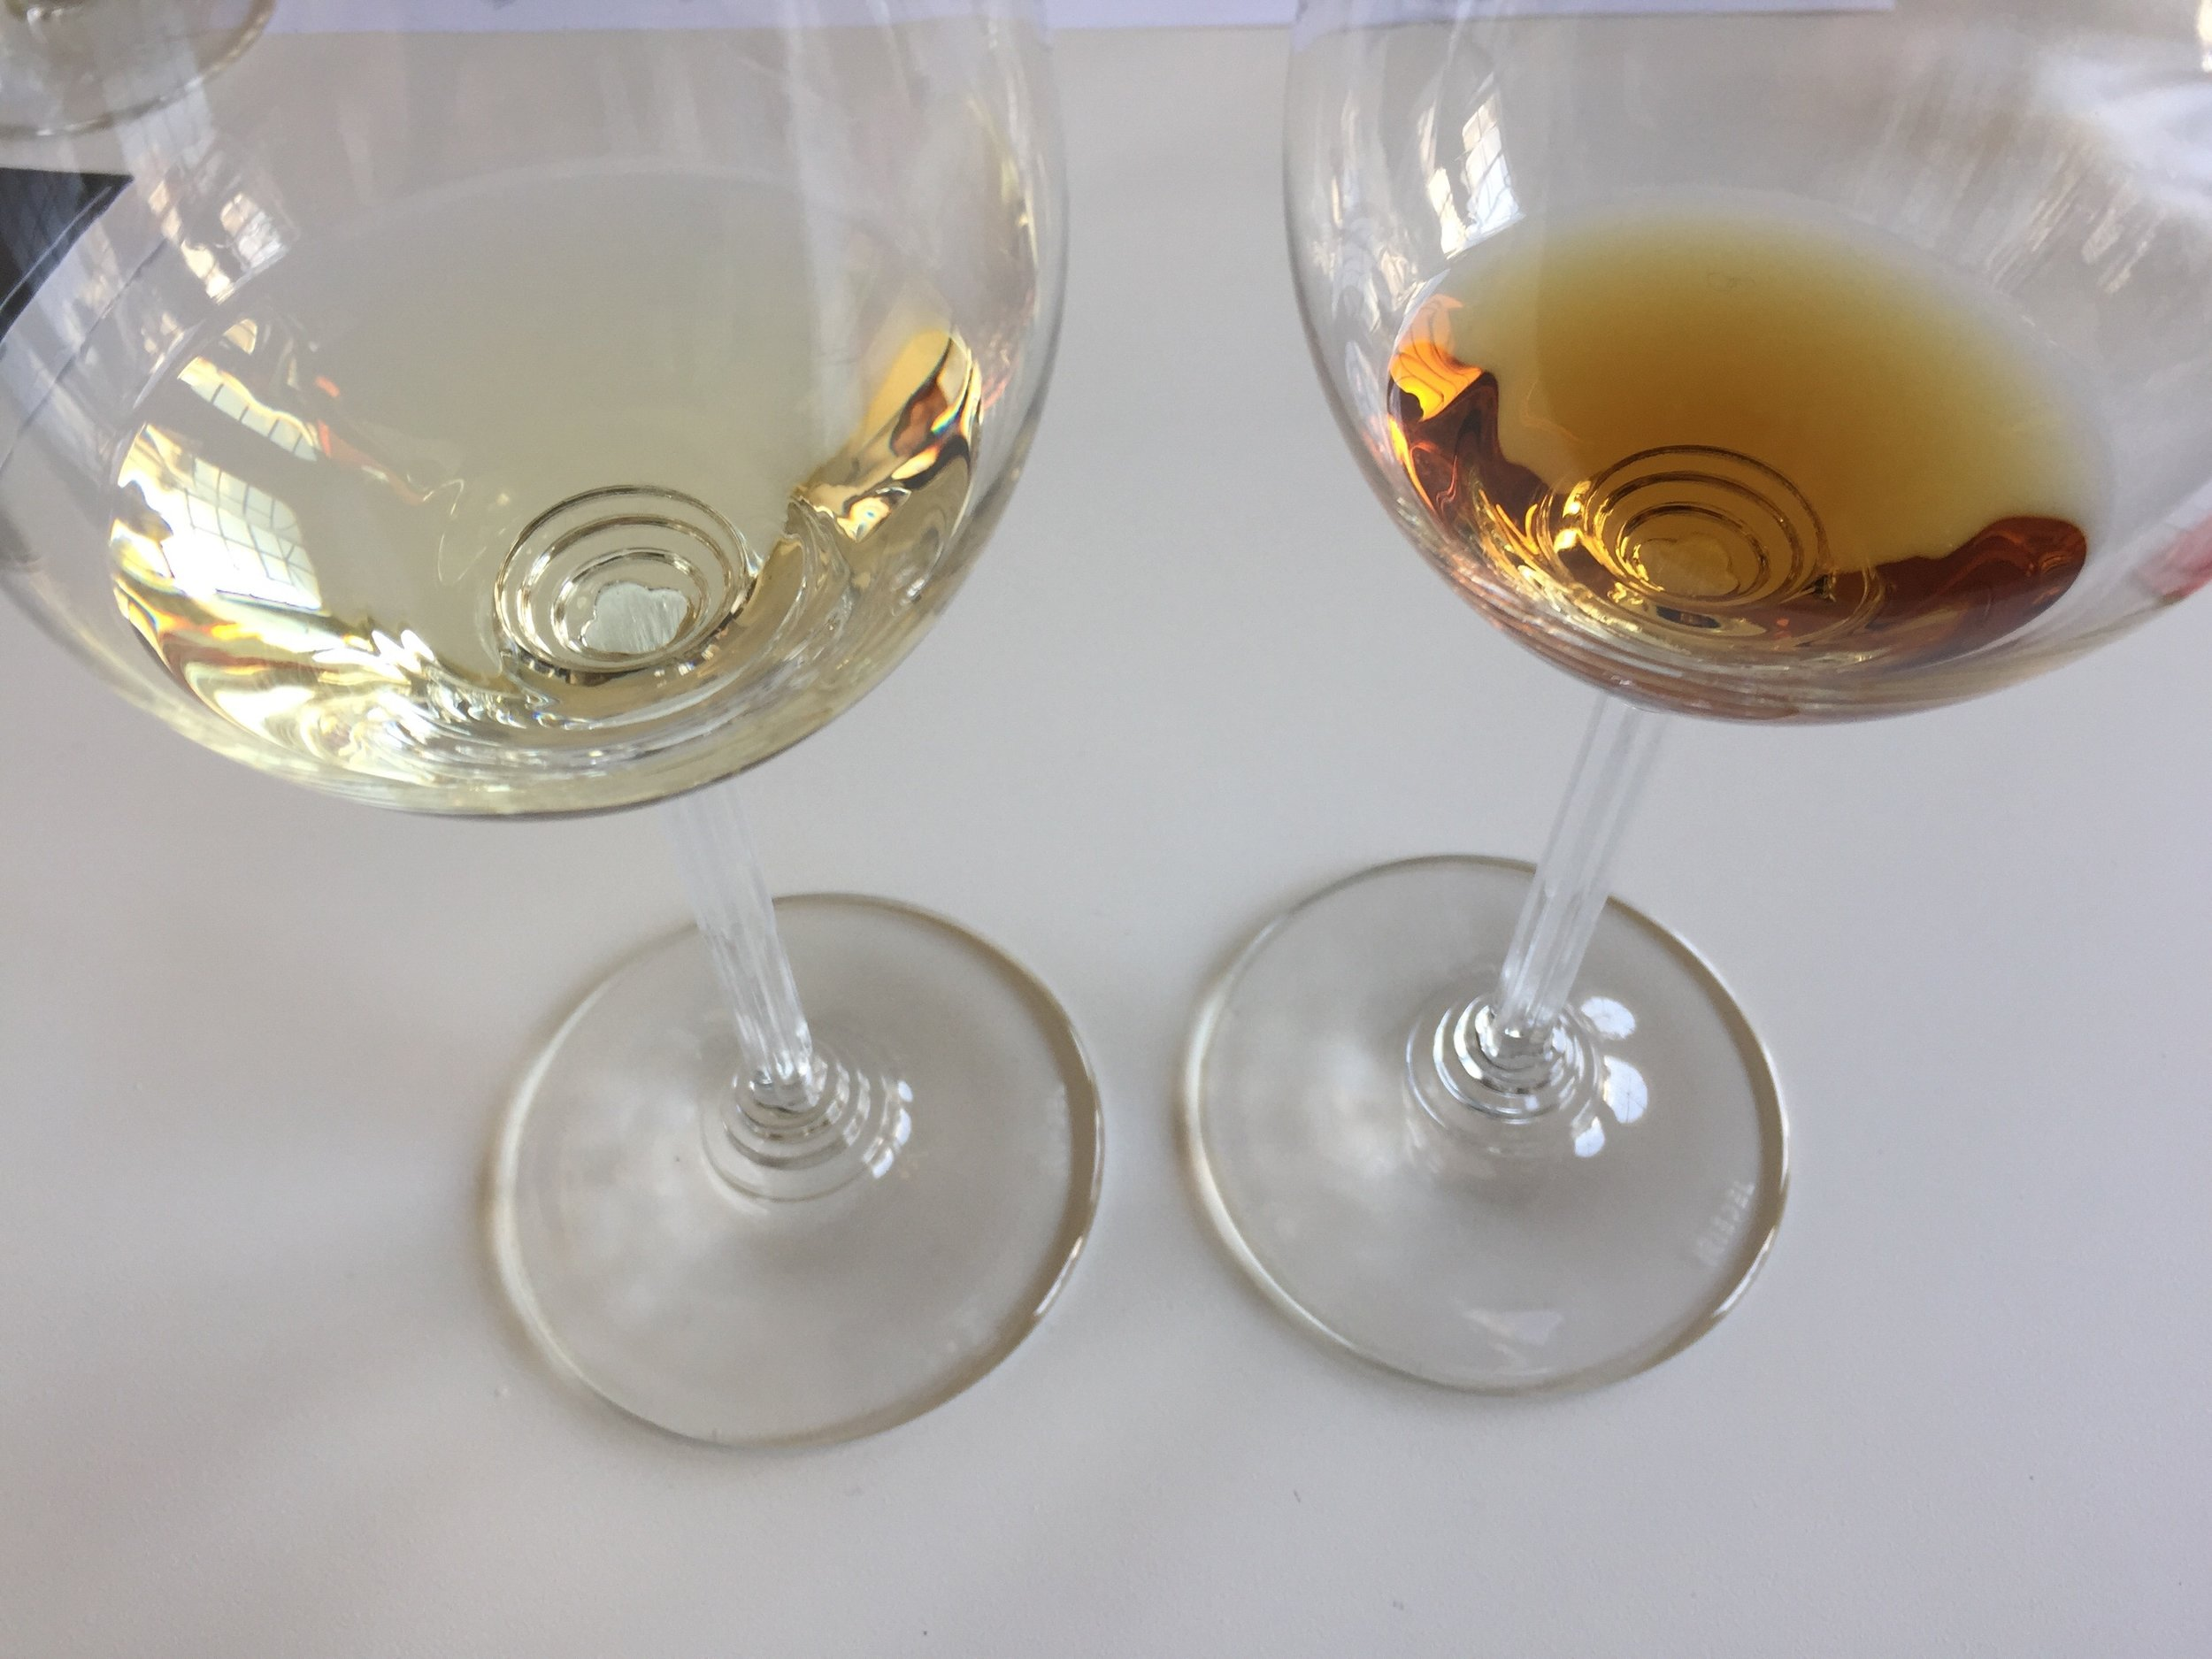 fino v. amontillado: the same wine but very different